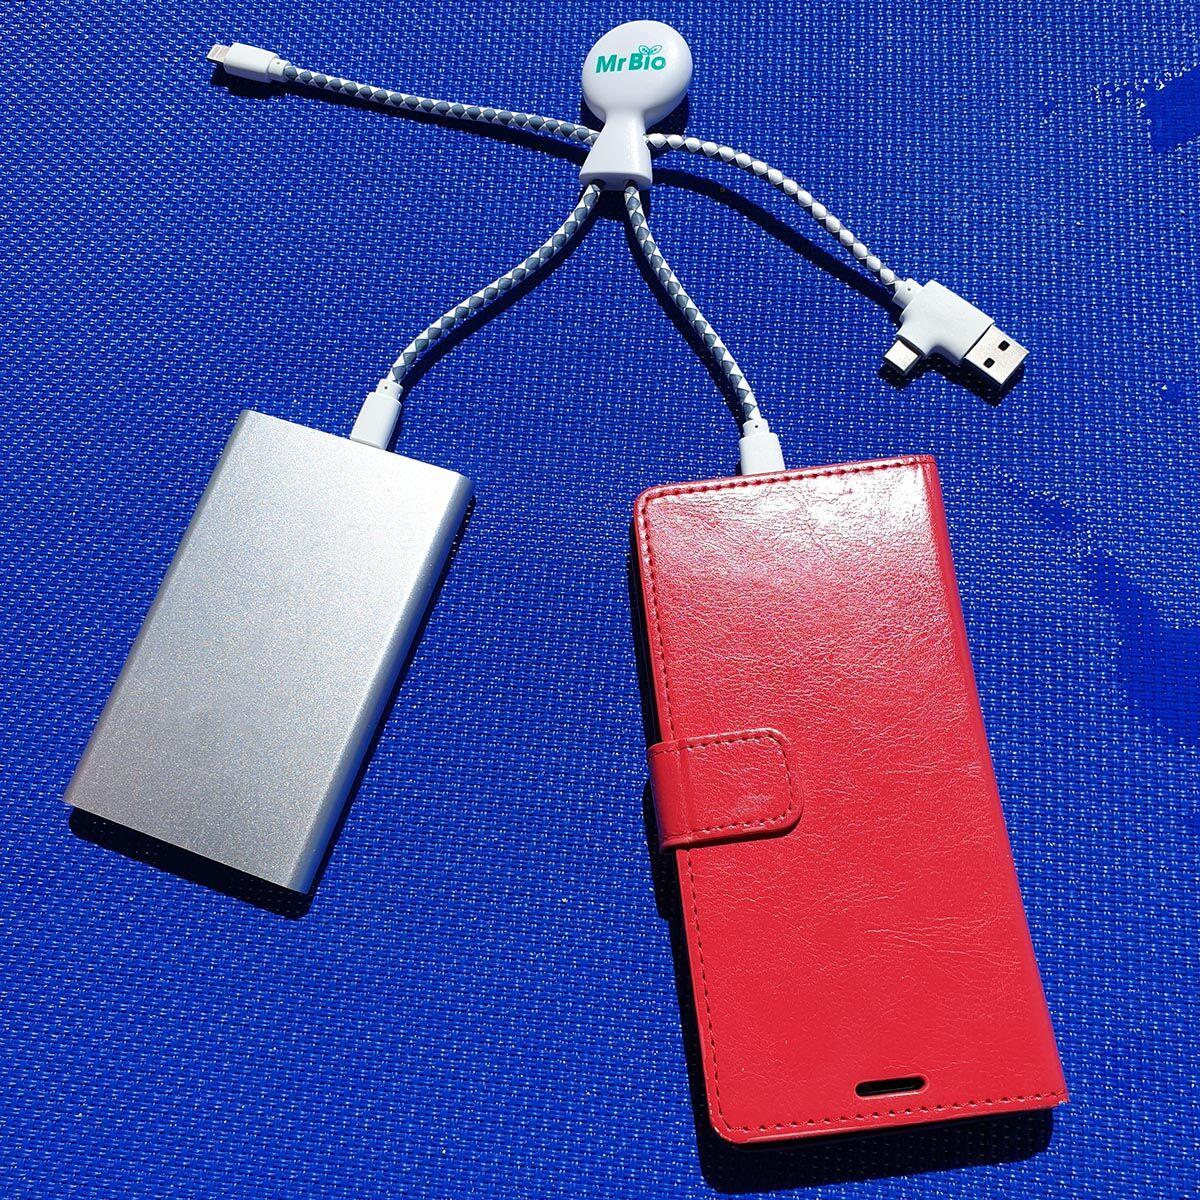 Mr Bio USB charging Cable